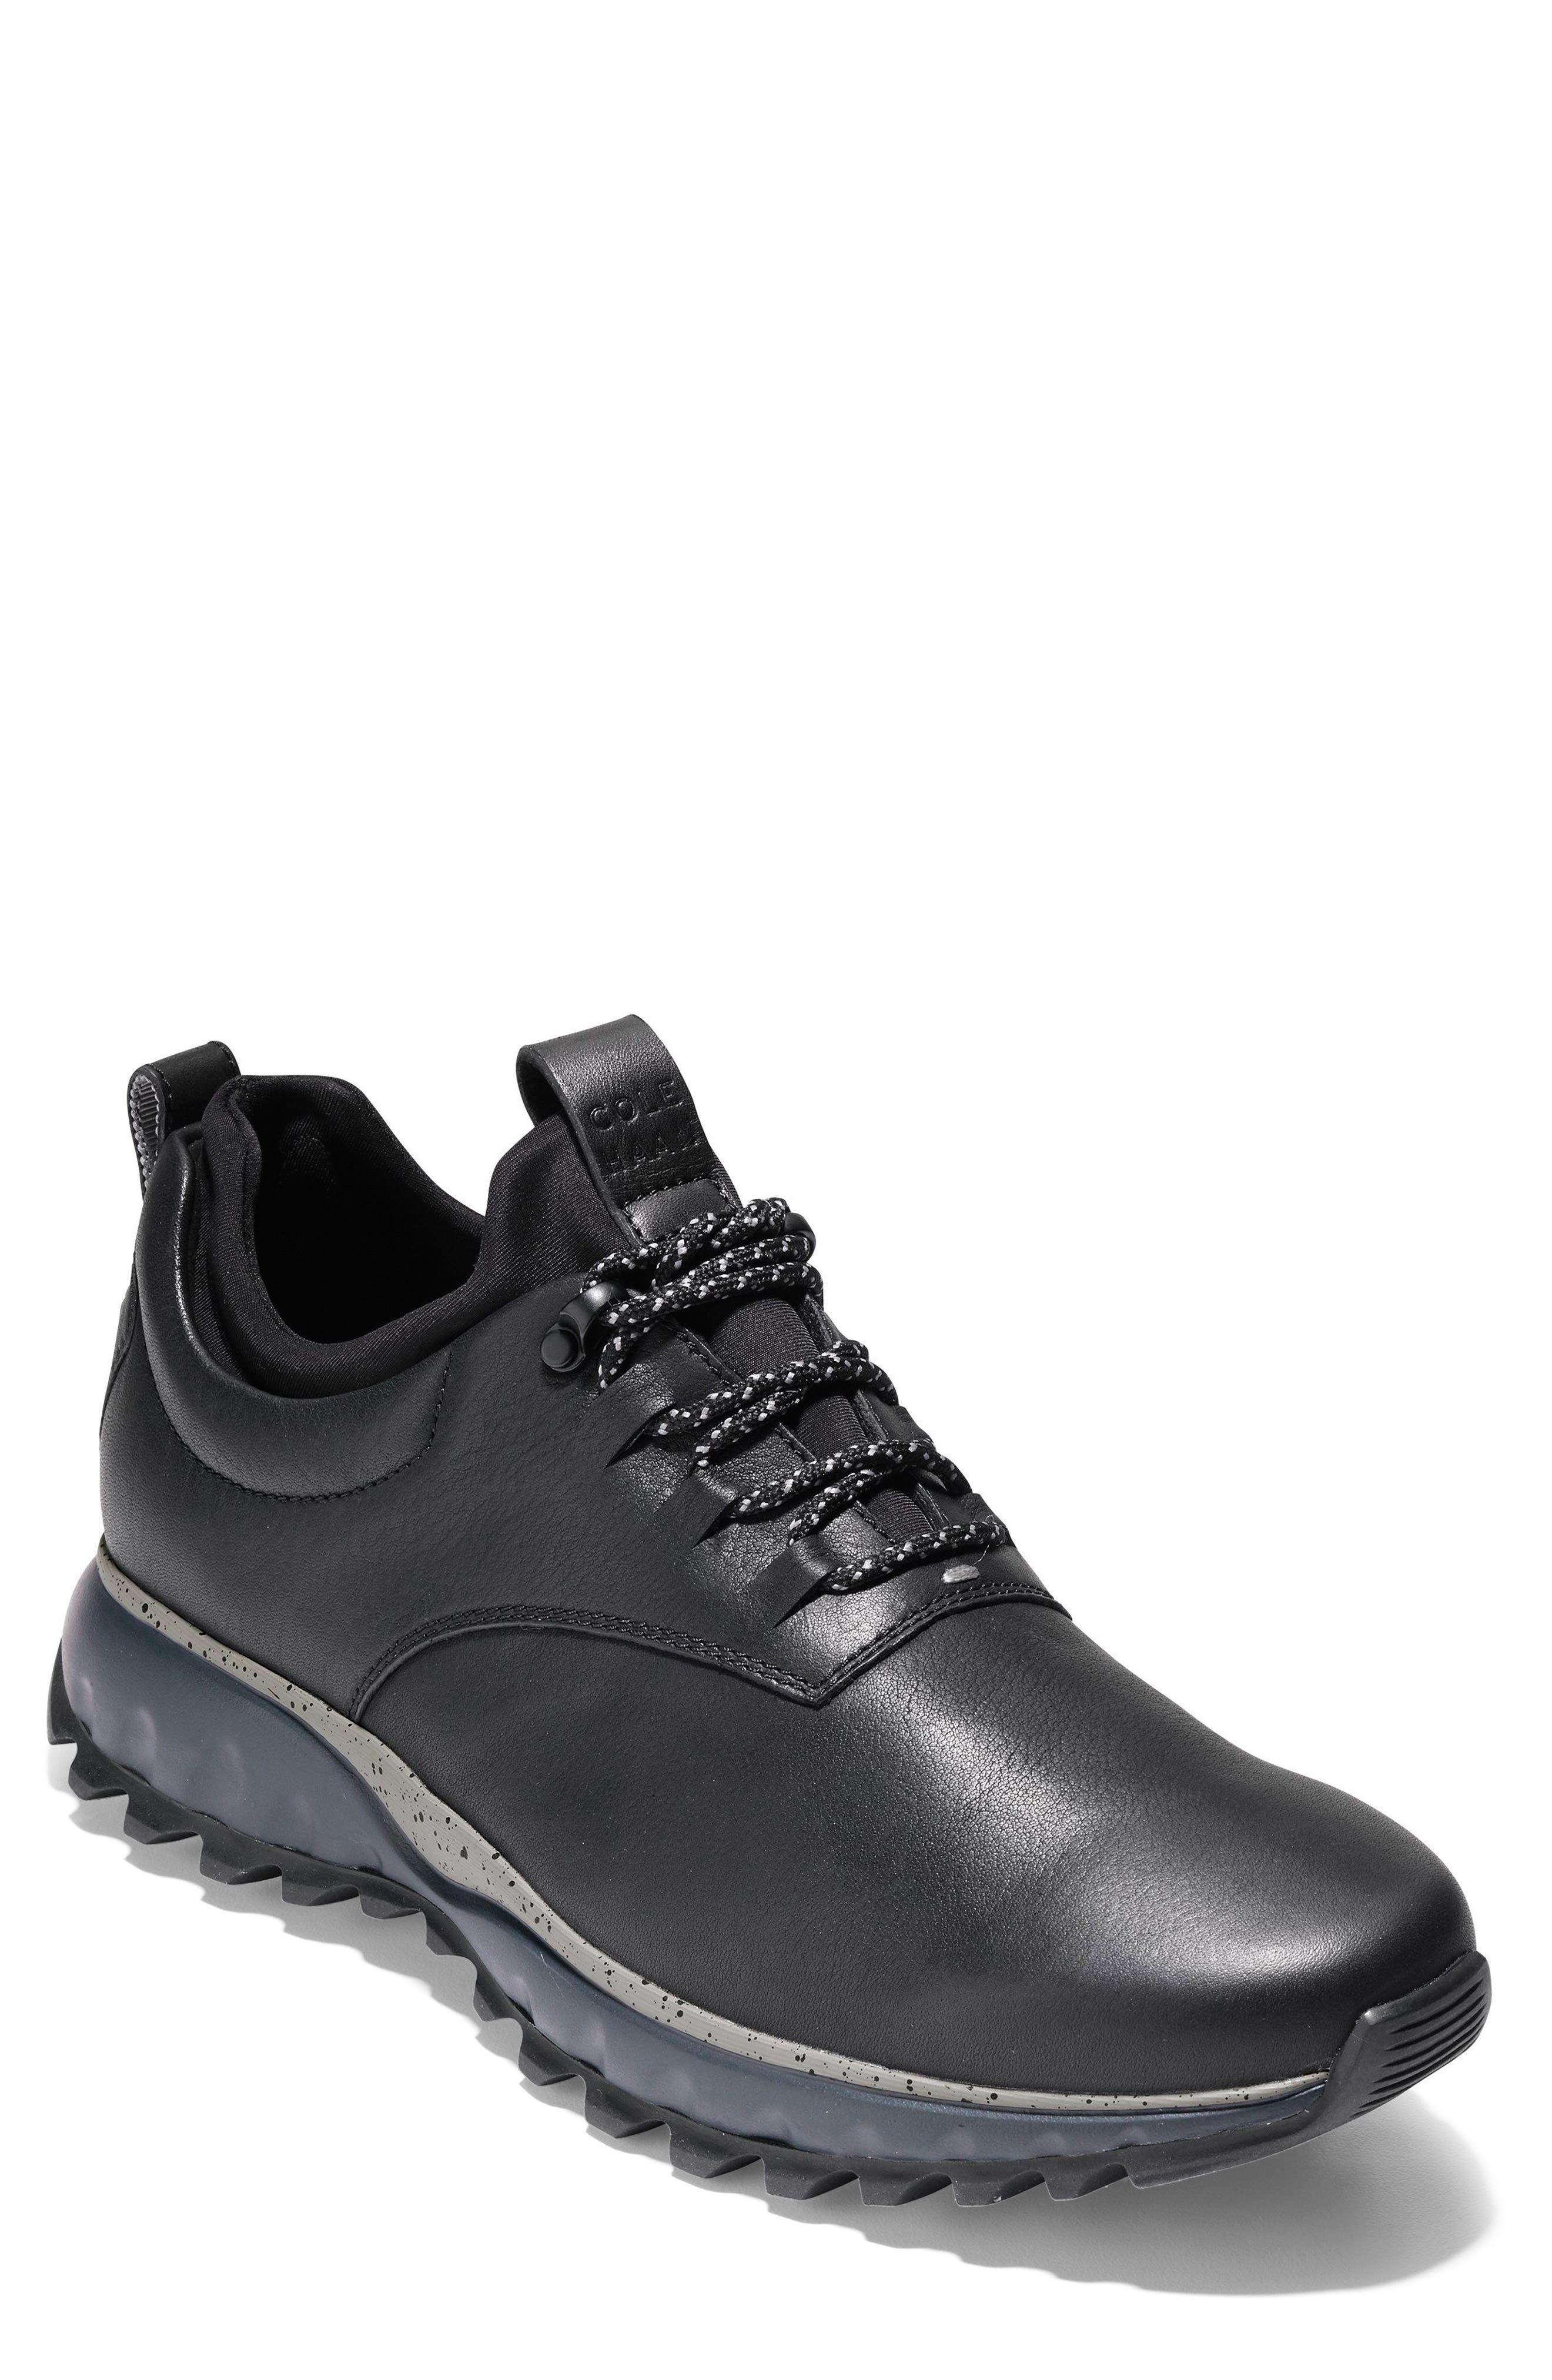 Cole Haan Grandexpl?re All Terrain Waterproof Sneaker, Black